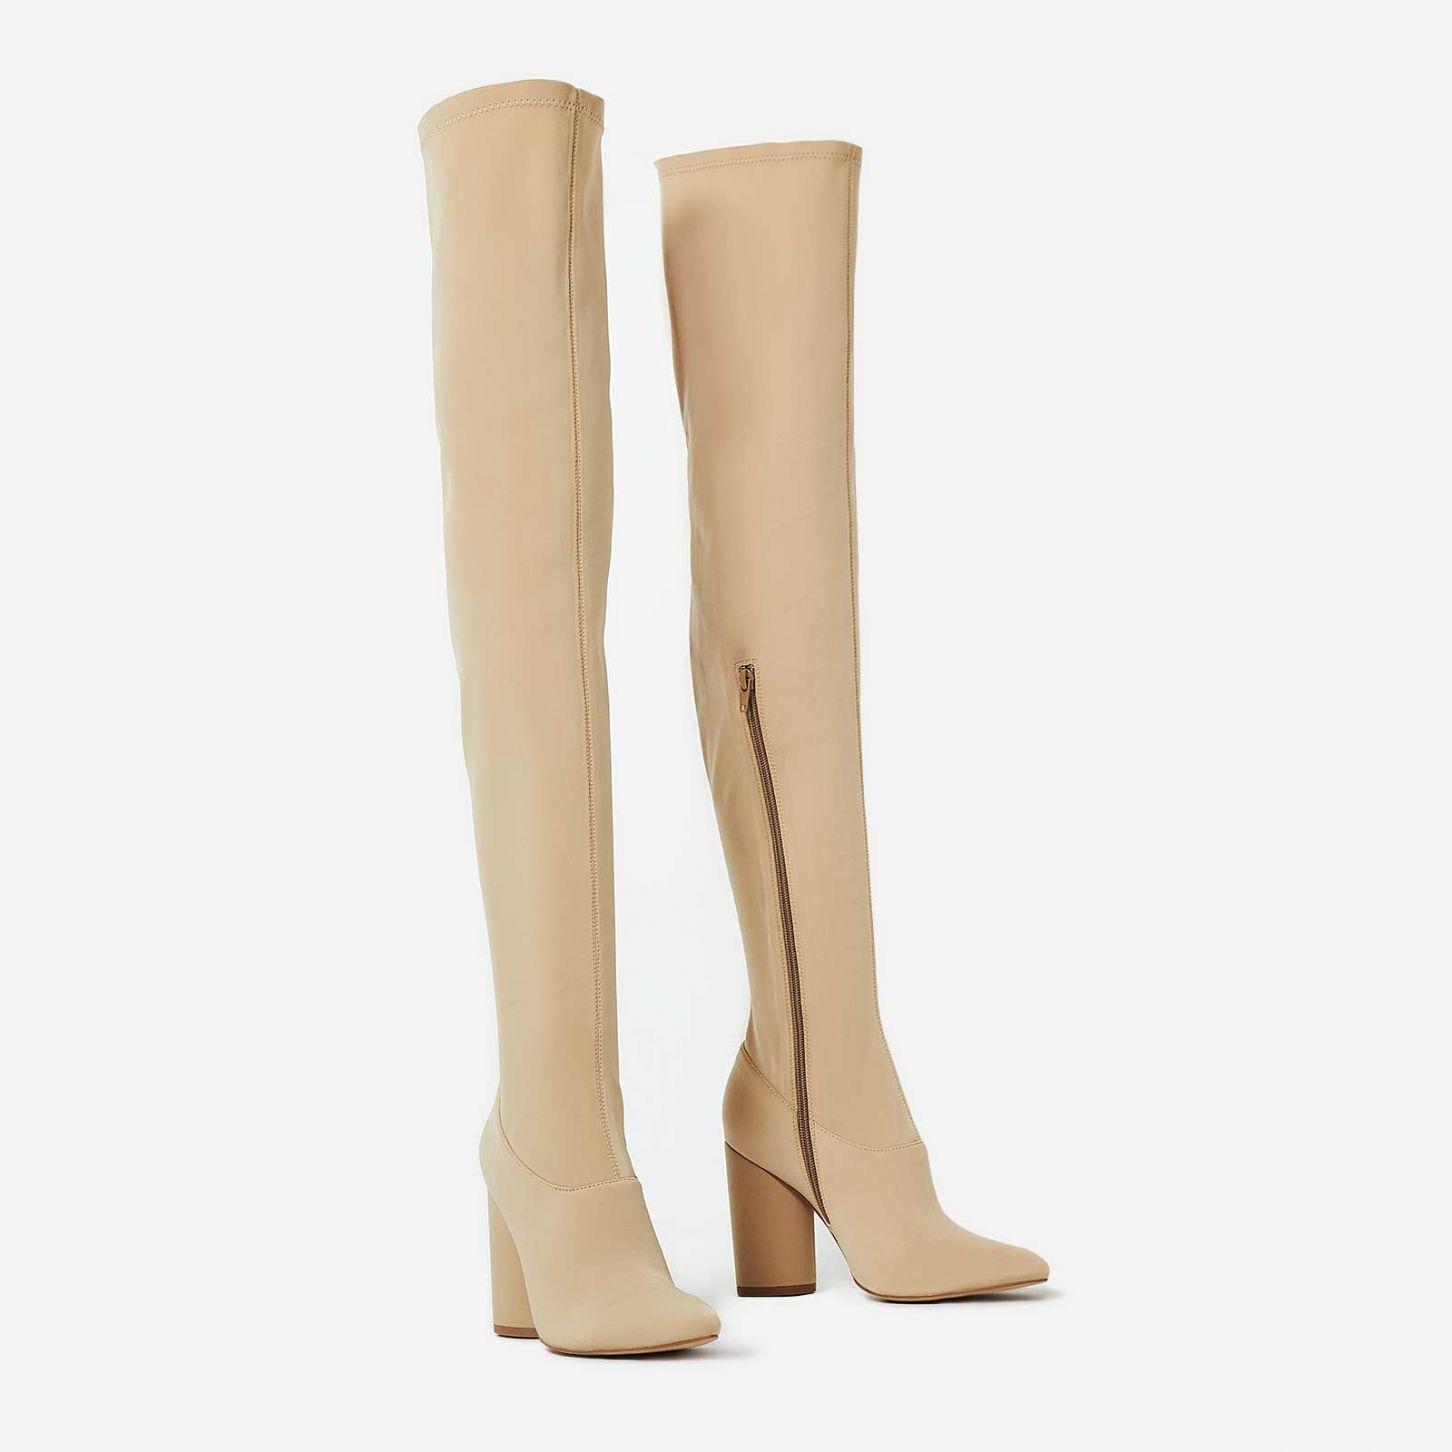 1237fda55fae Jamila Thigh High Long Boot In Nude Lycra